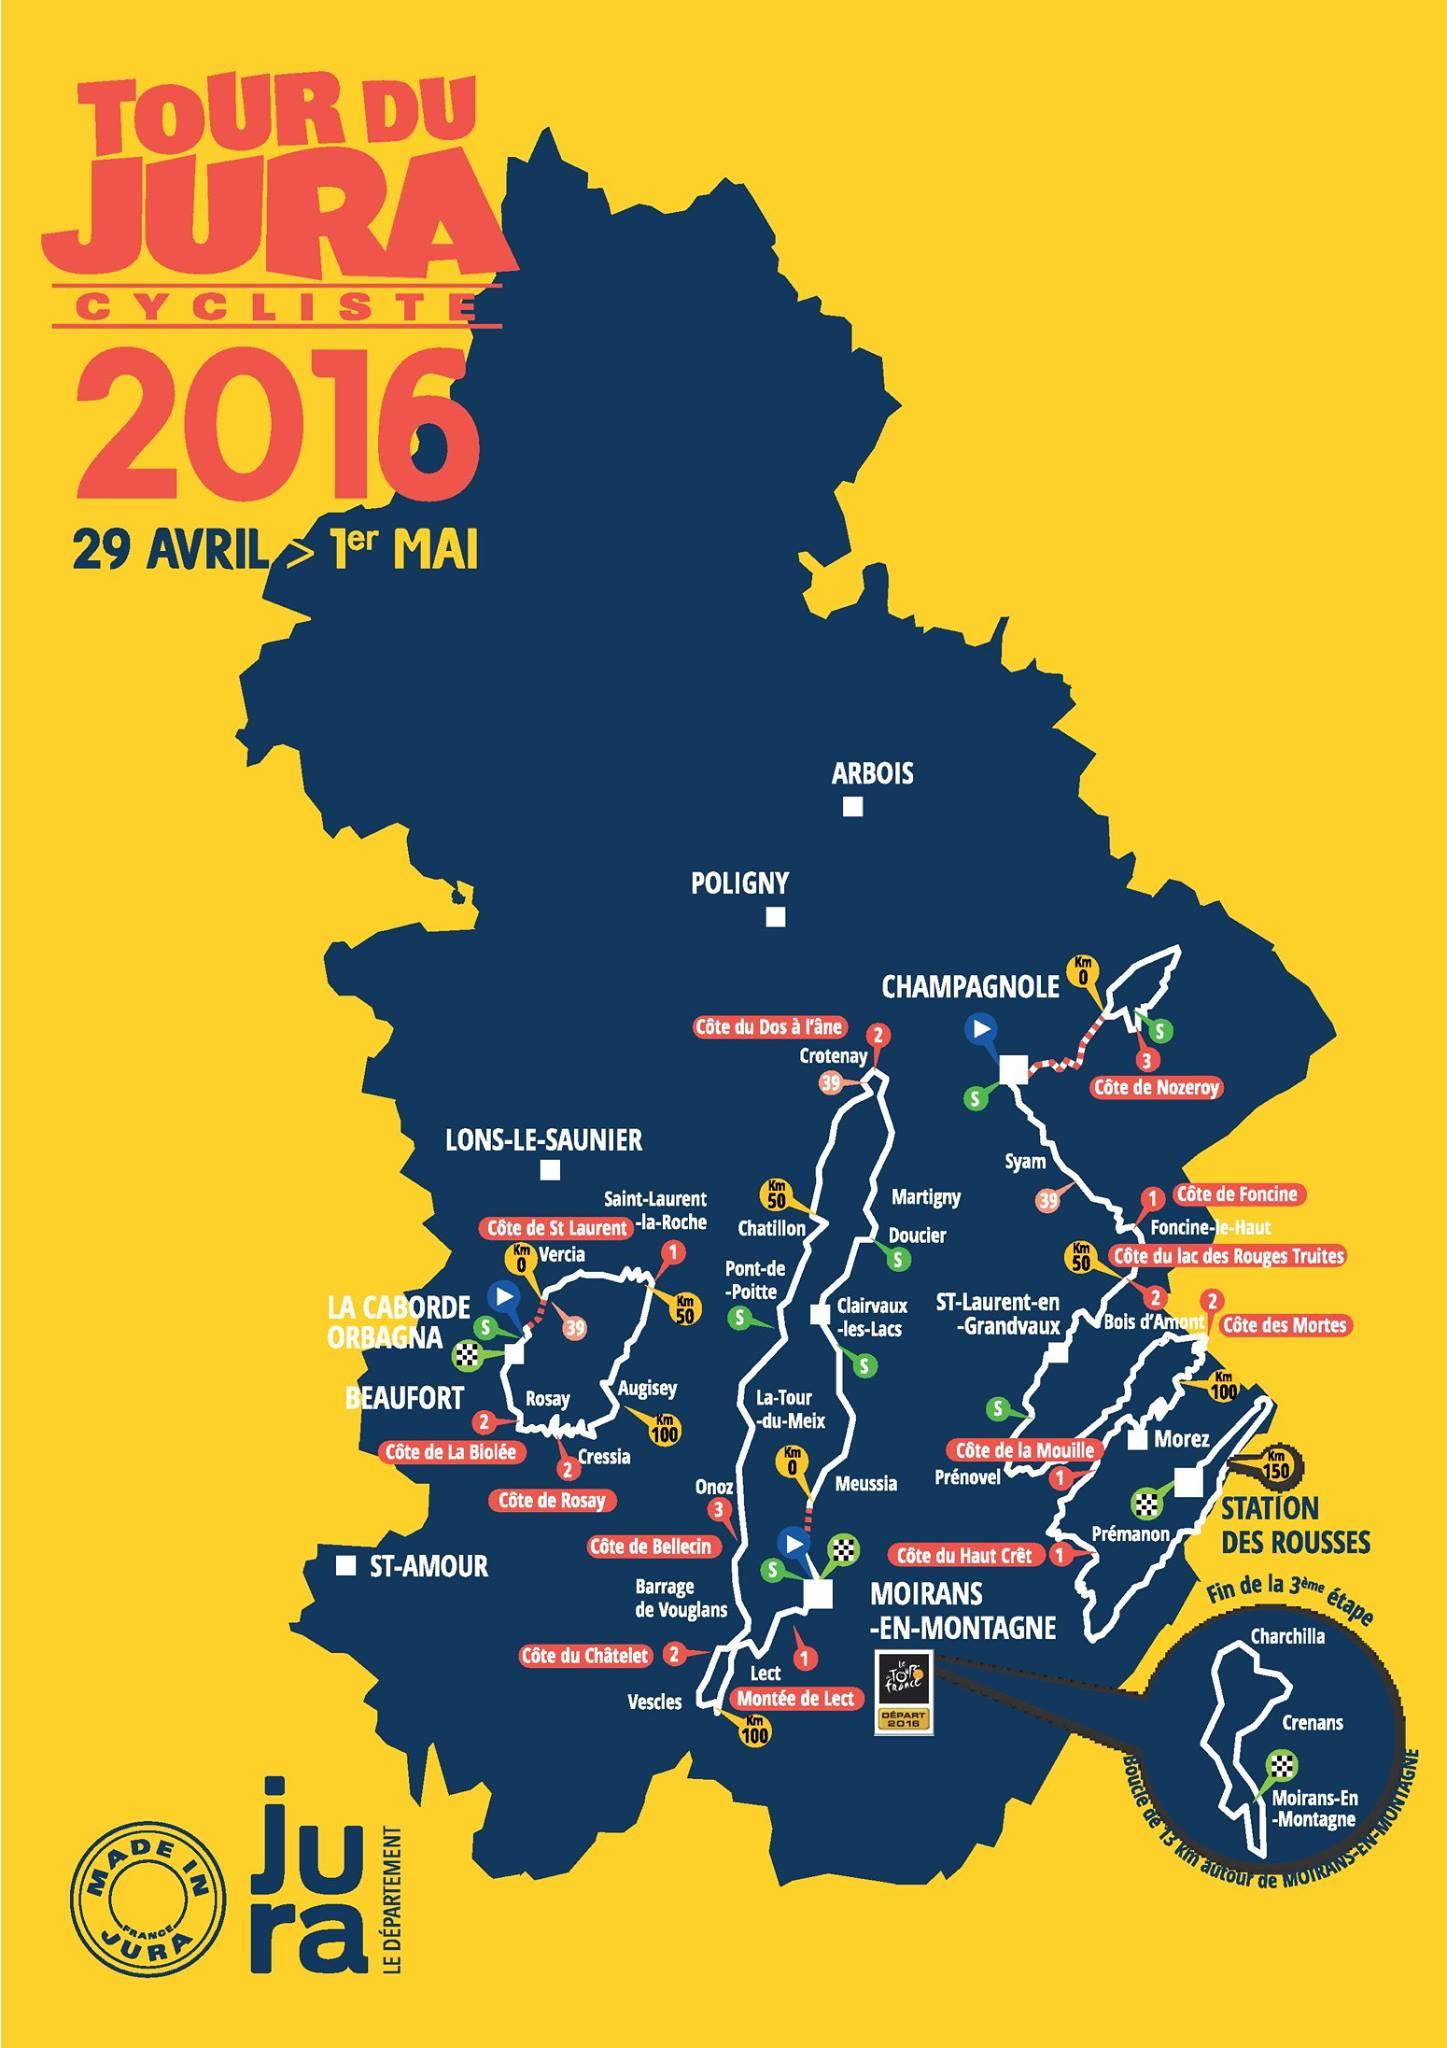 Partenariat Tour du Jura Cycliste 2016